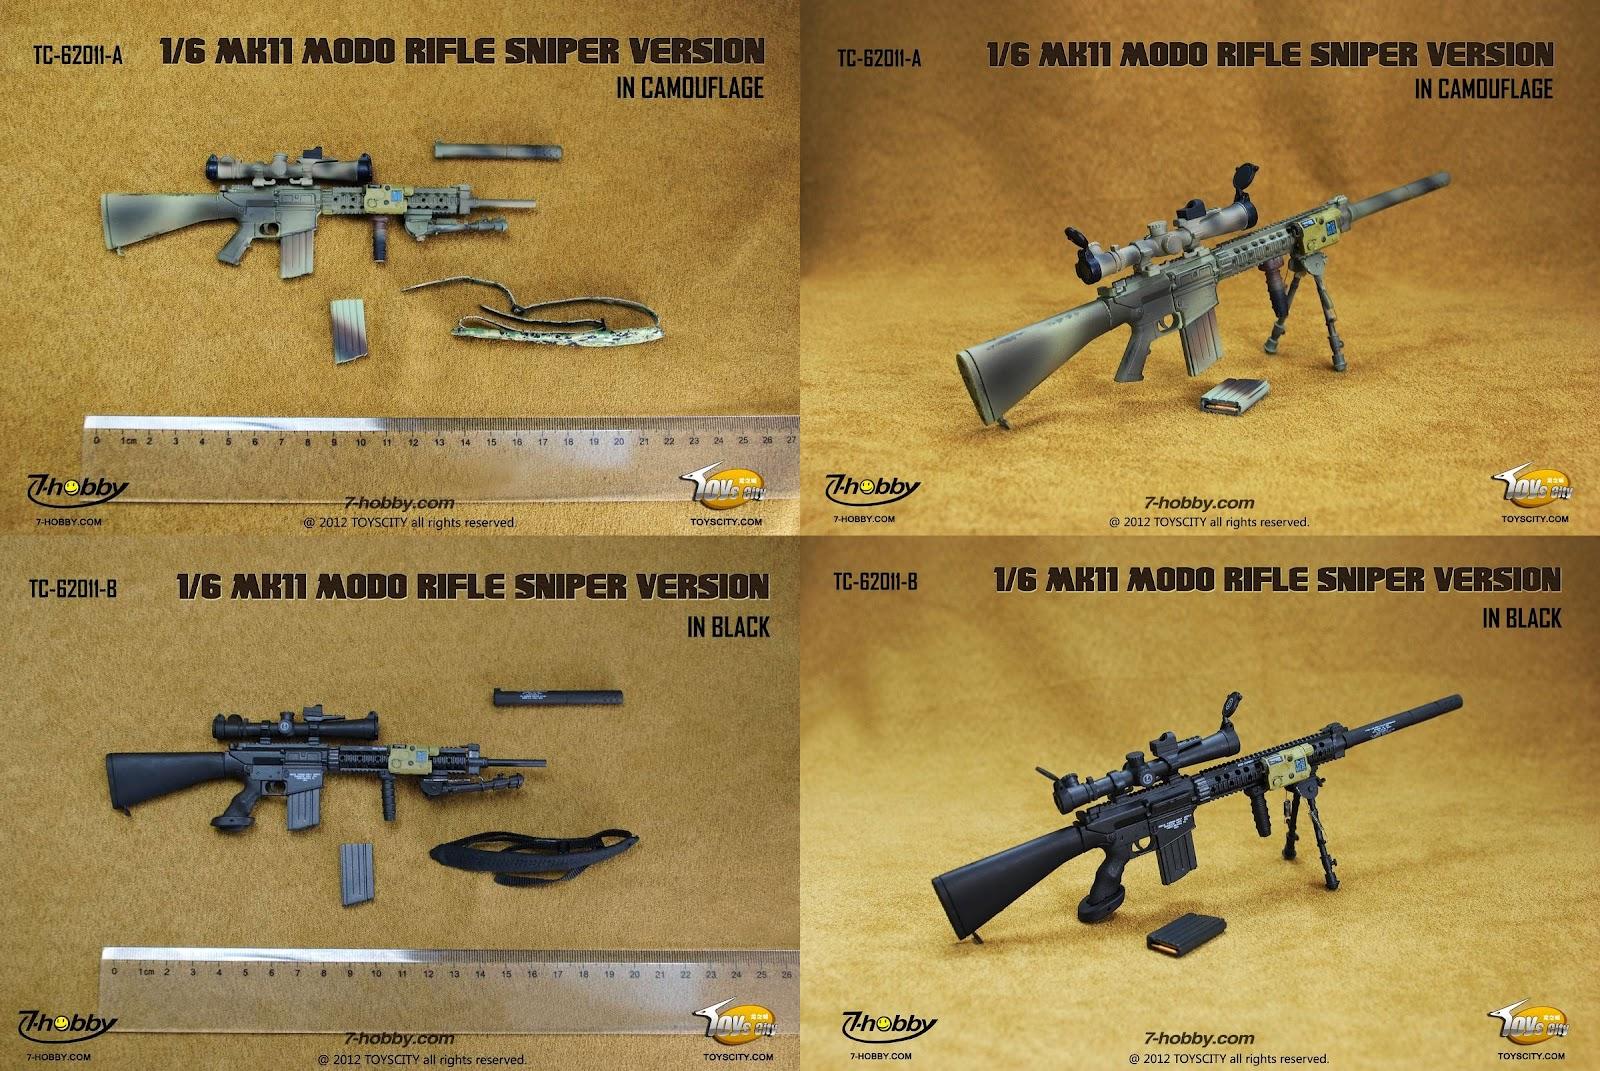 MK 11 Sniper - eurusdgraph com